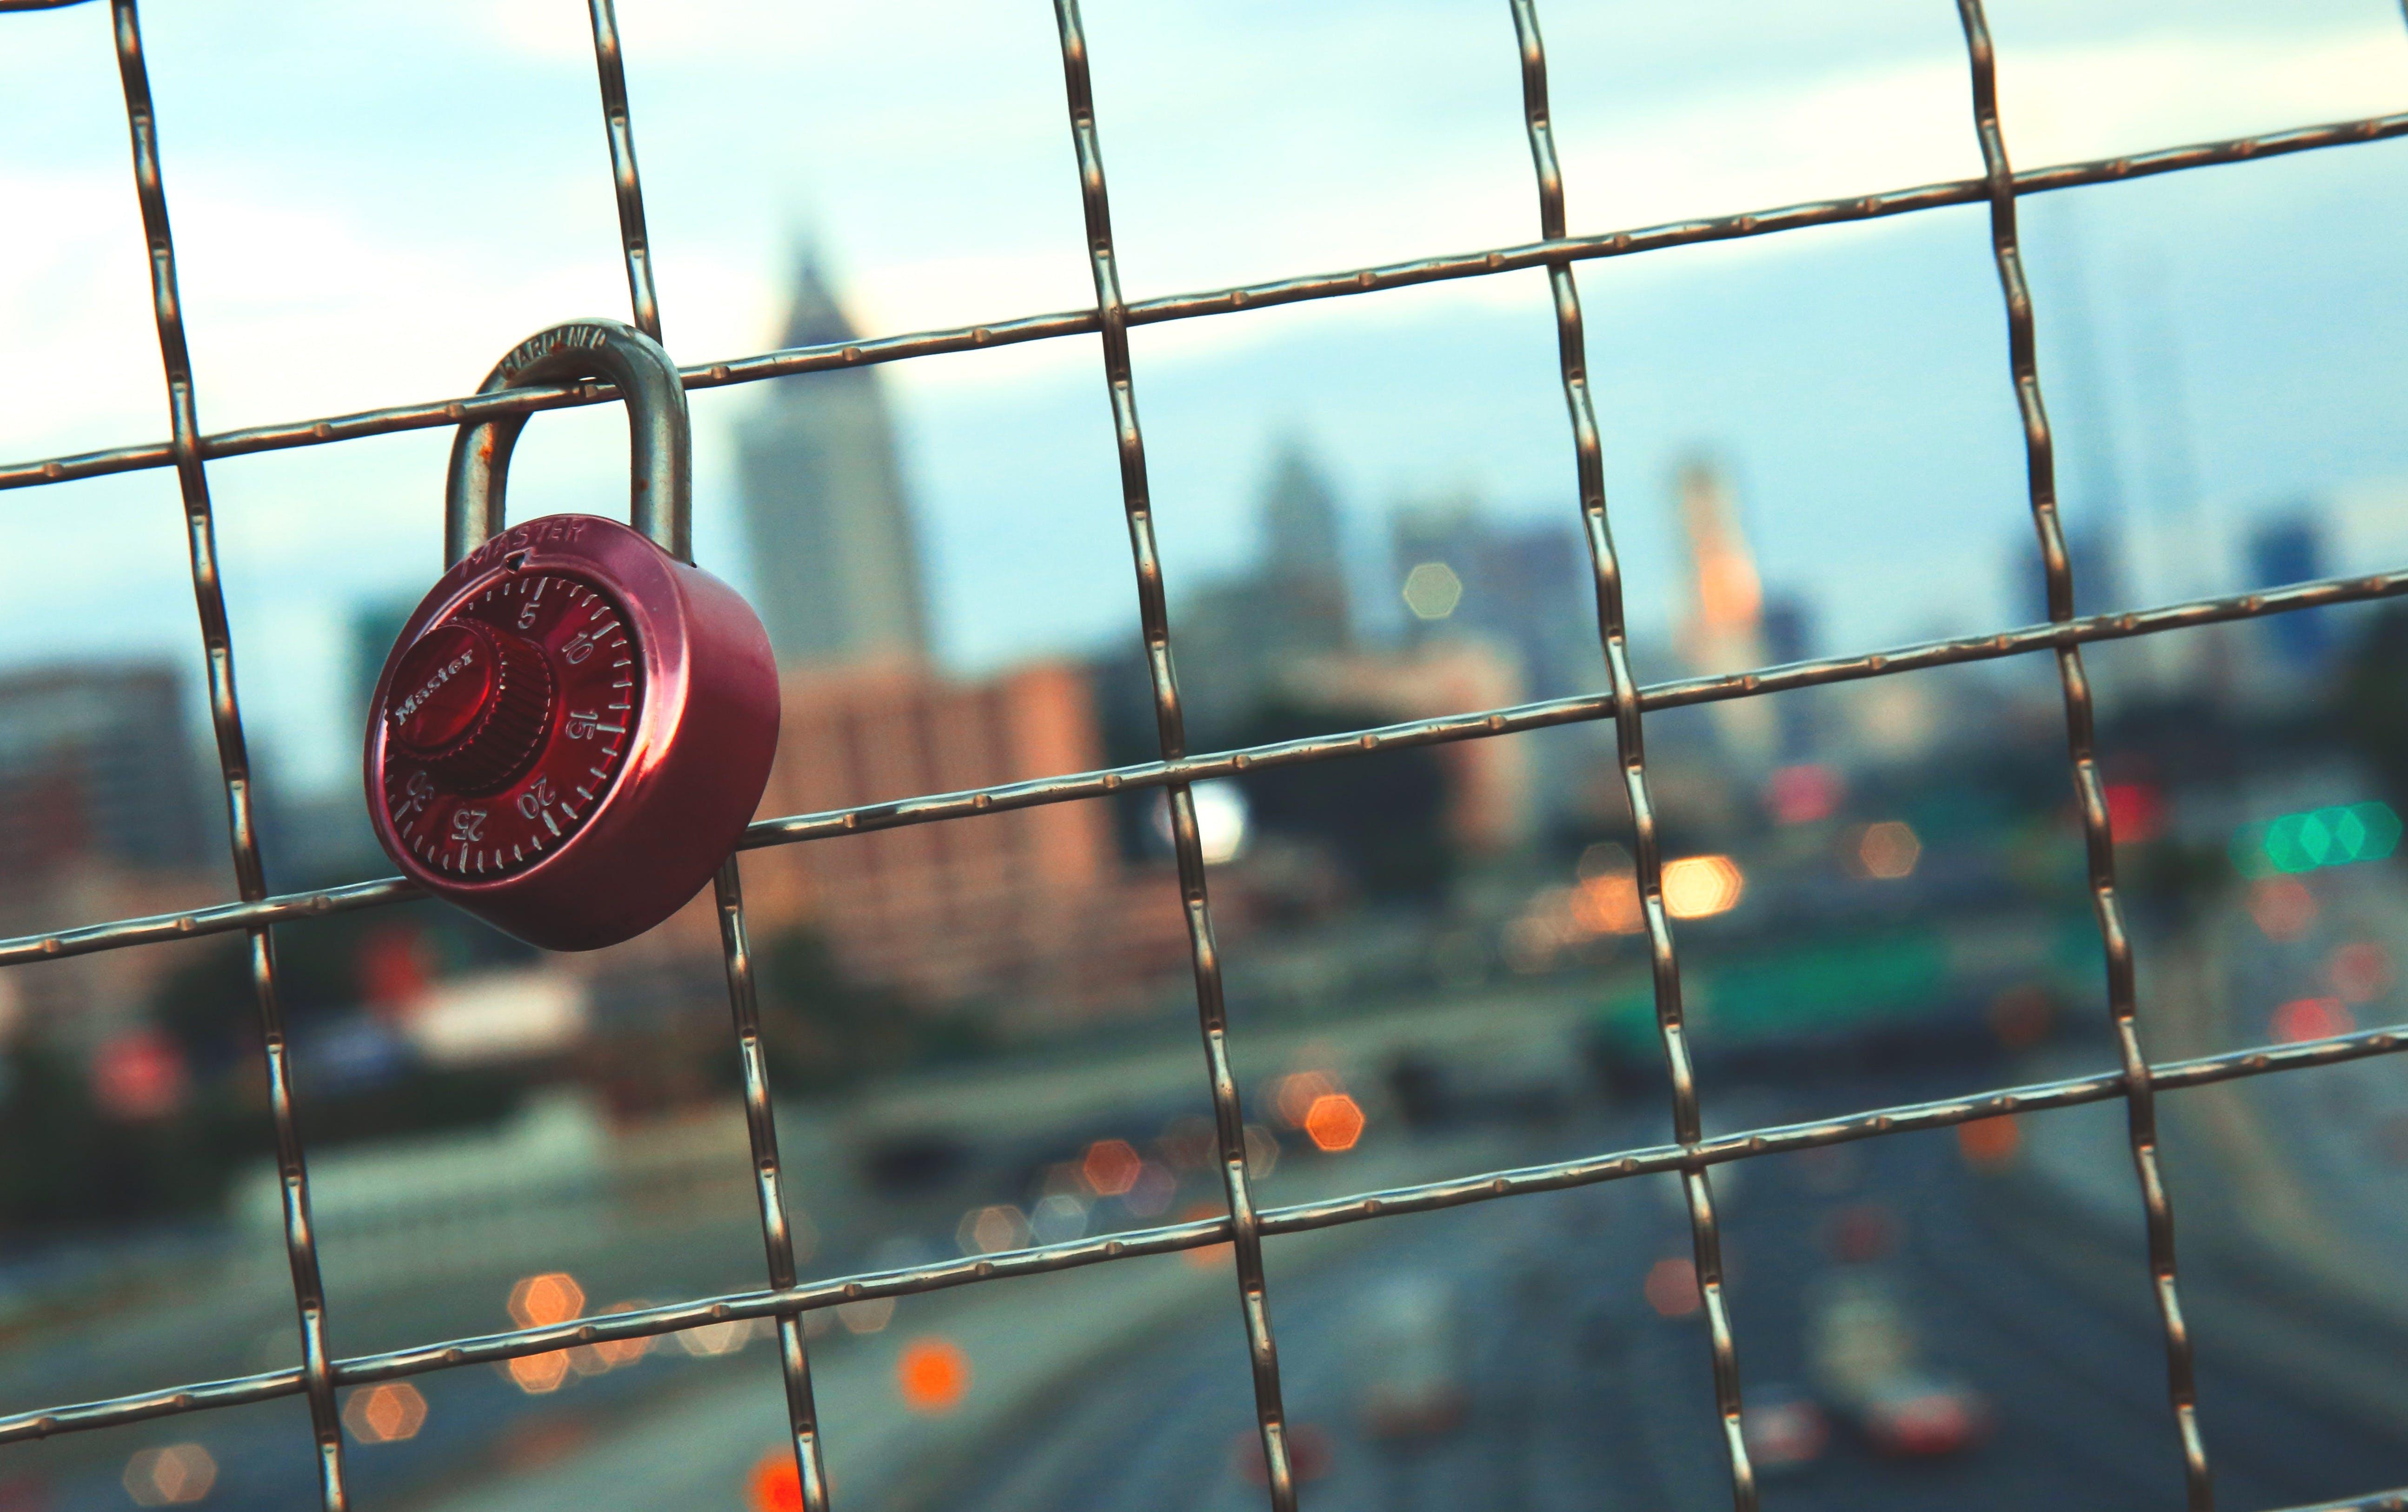 Key on Railings in Shallow Focus Lens